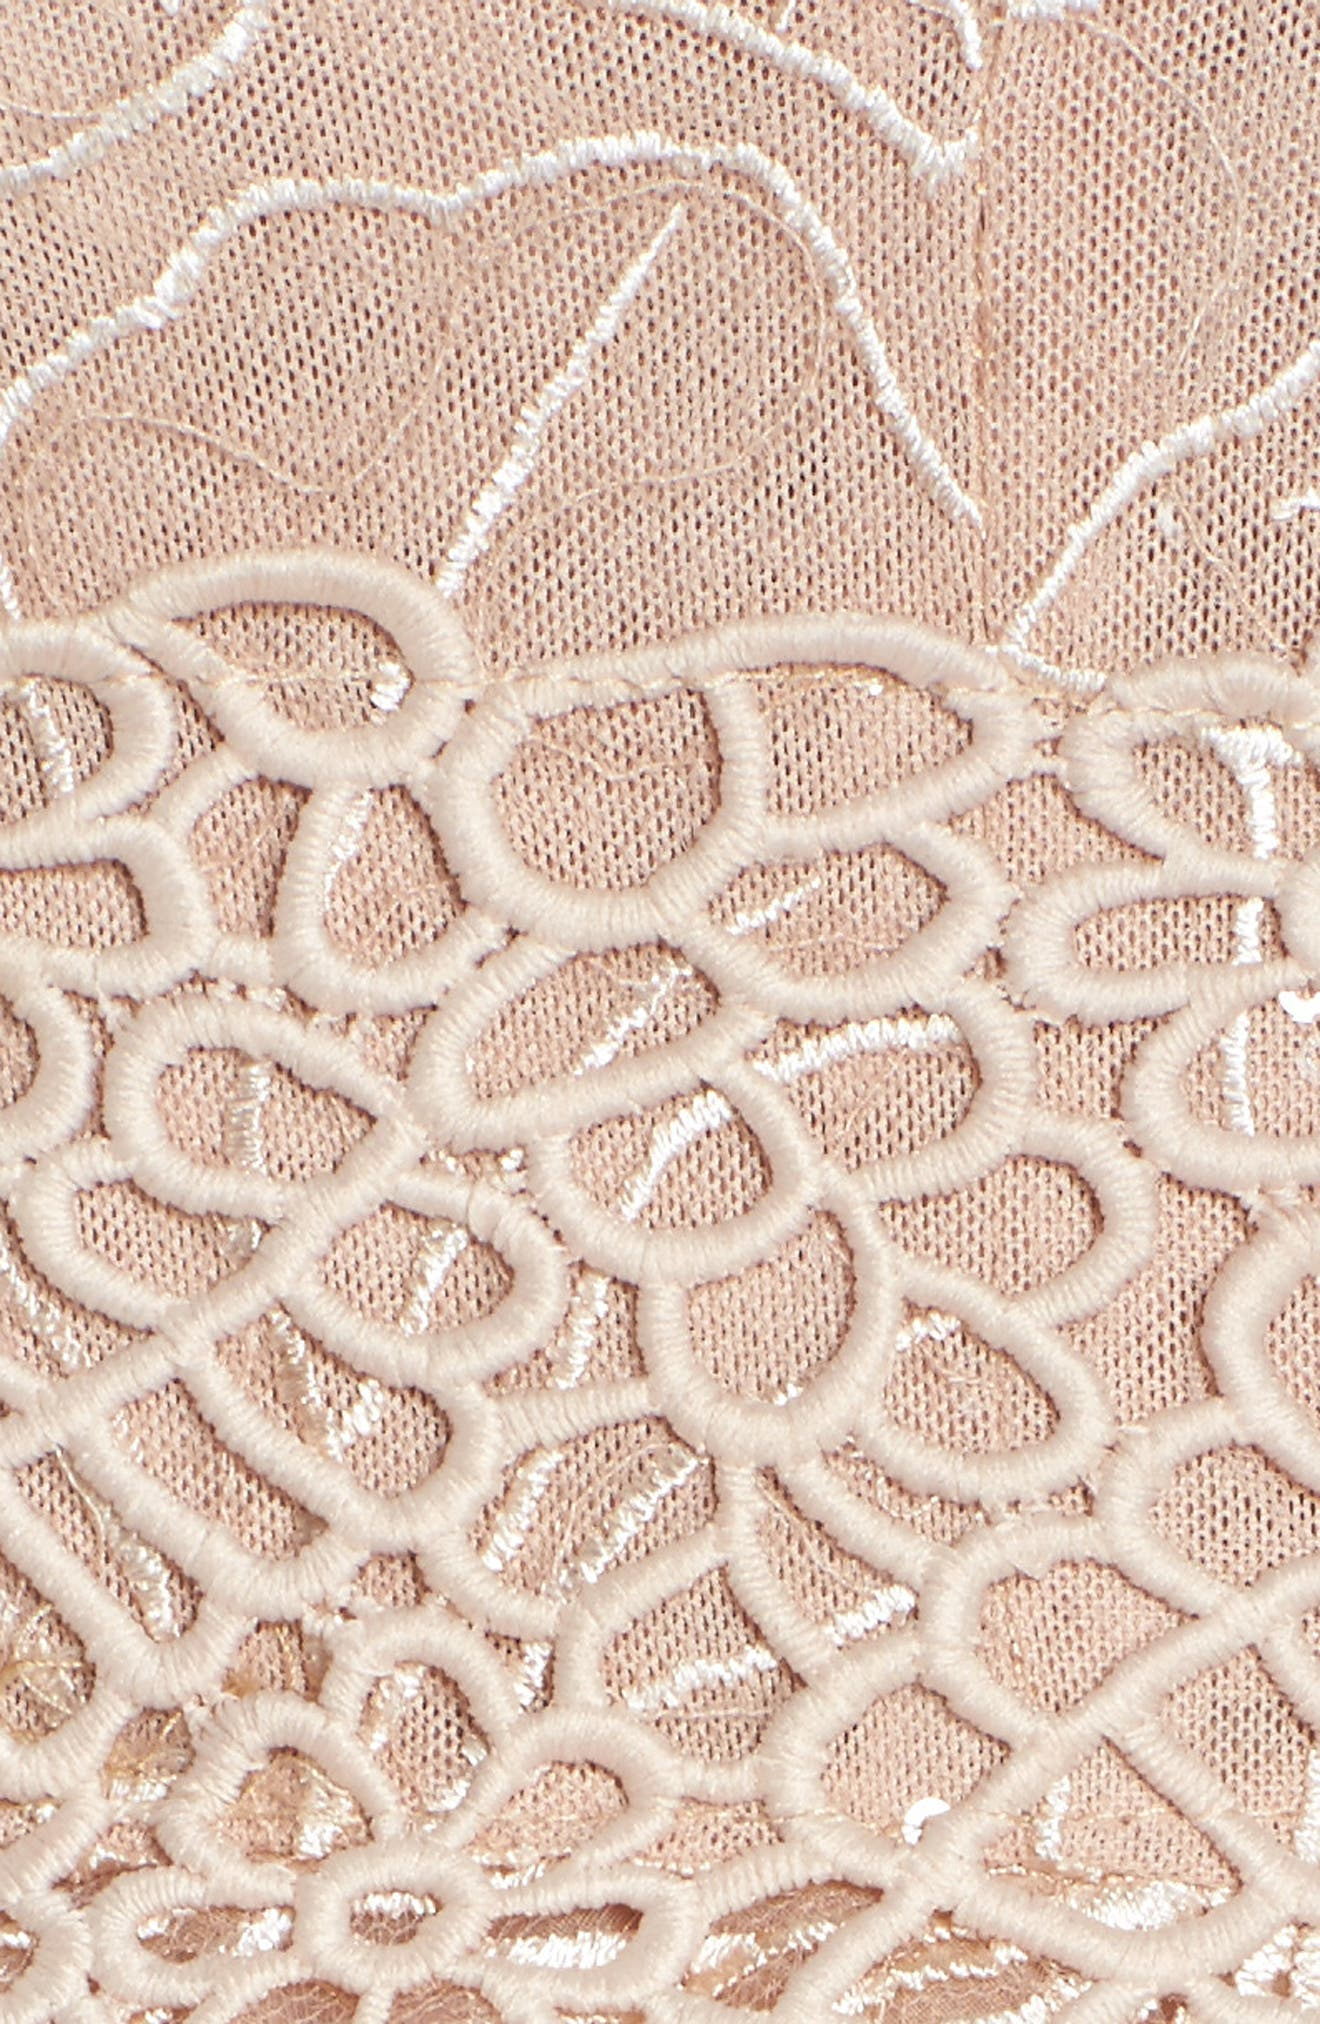 Fiore Sequin Fit & Flare Dress,                             Alternate thumbnail 5, color,                             Beige